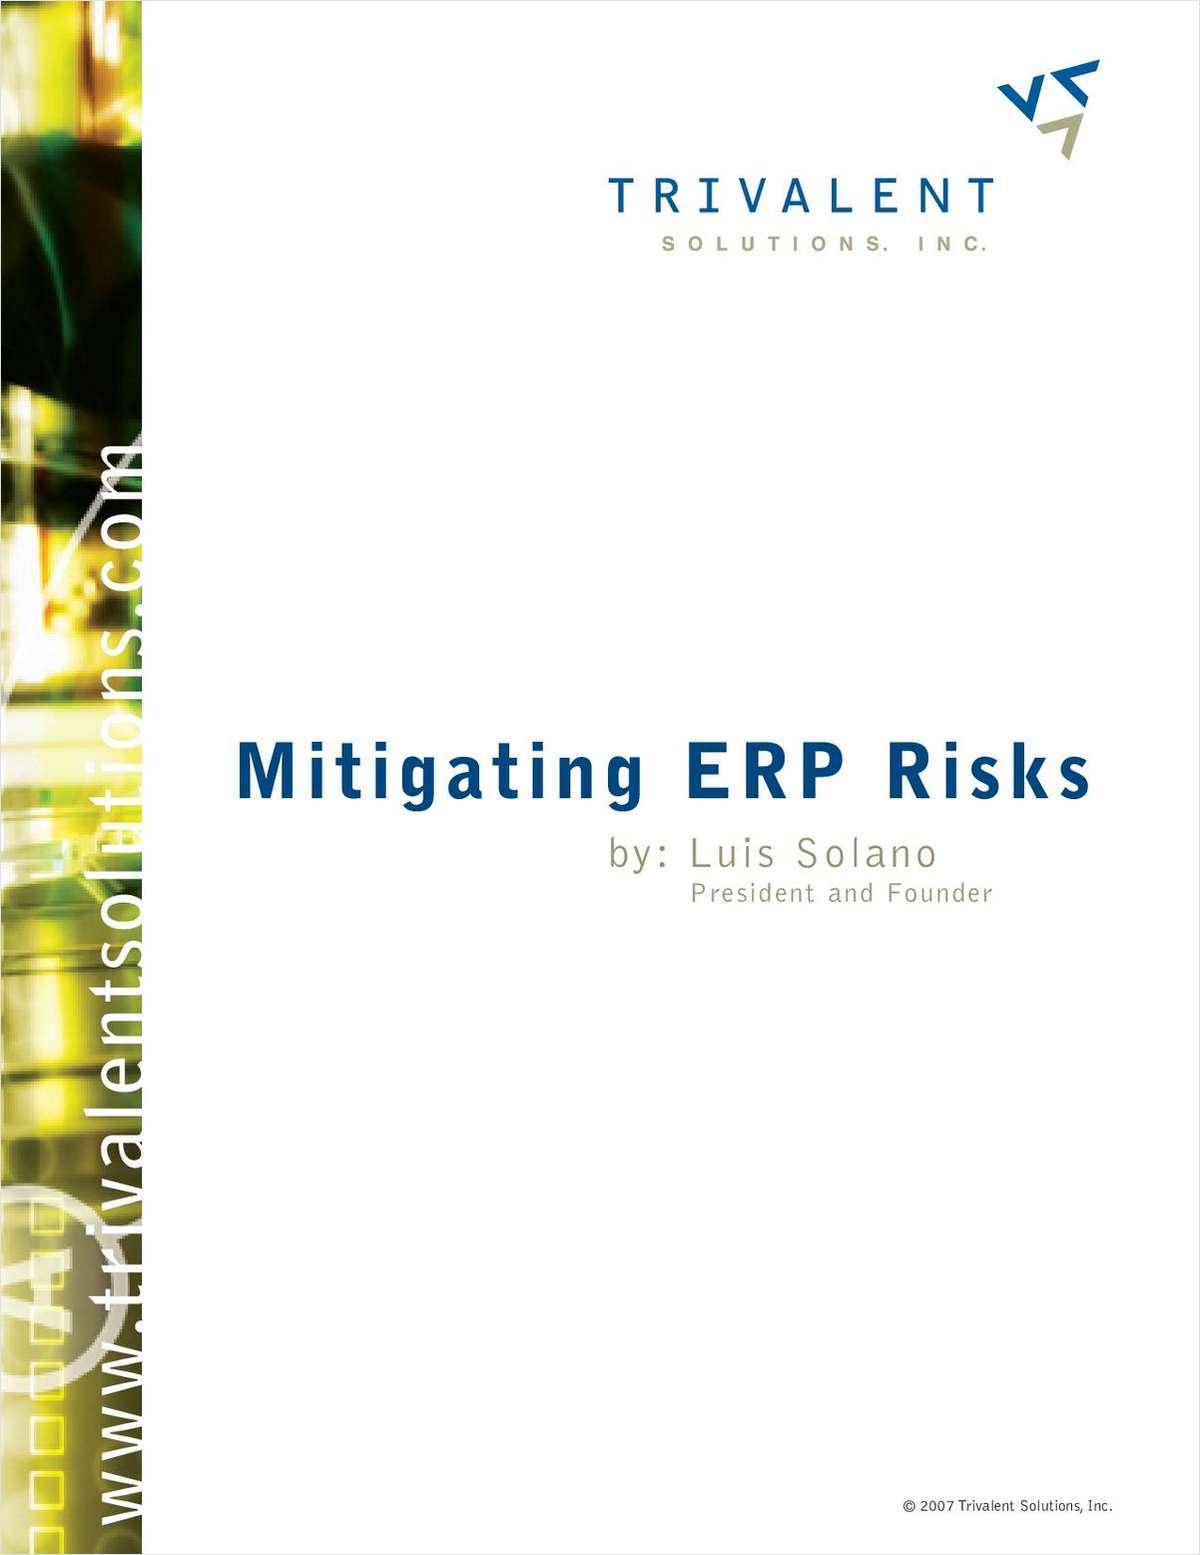 Mitigating ERP Risks